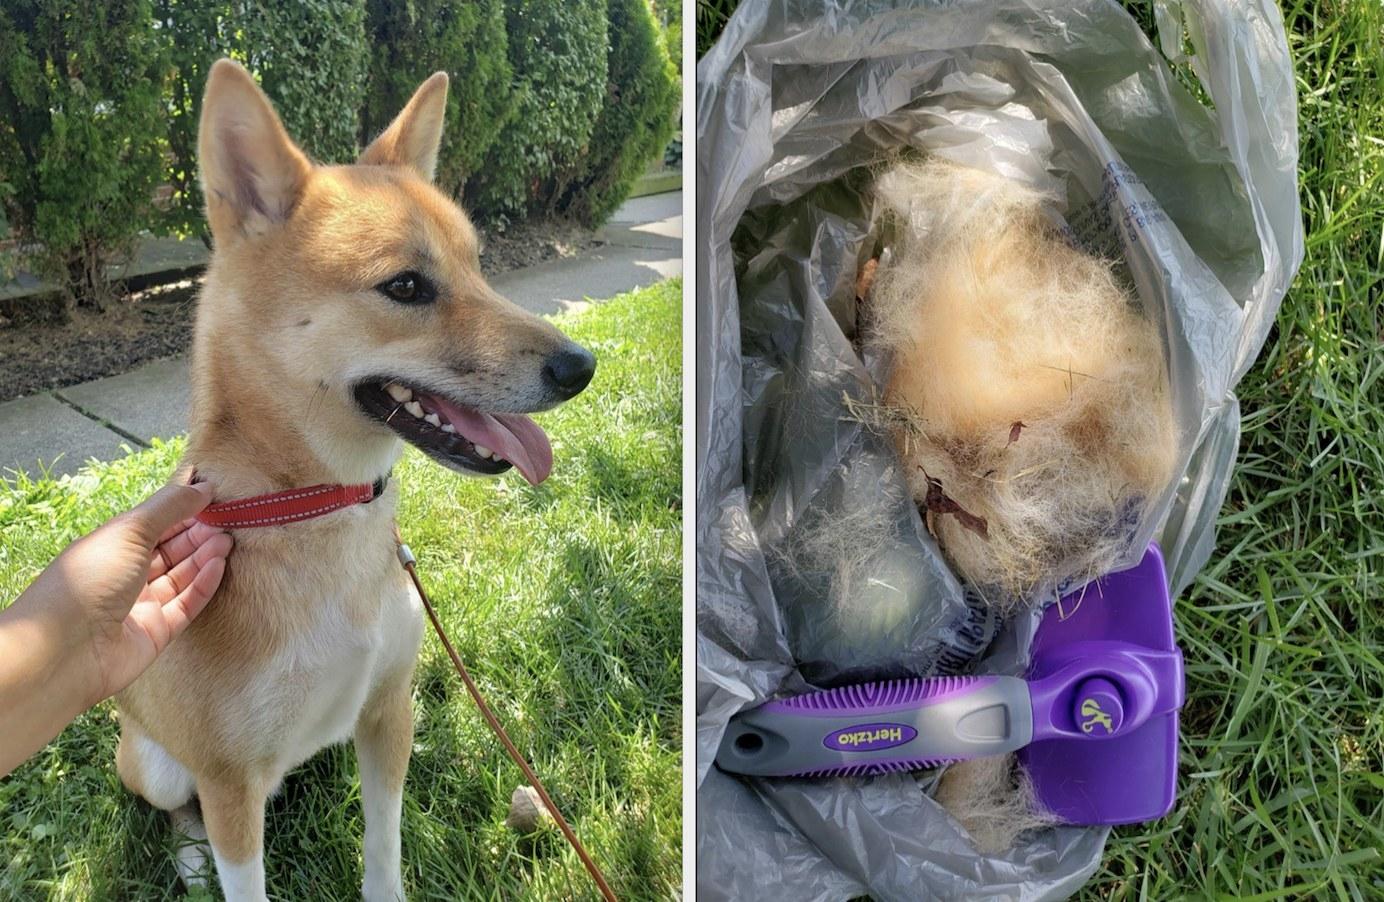 First image: dog smiling after being brushed. Second image: garbage bag full of brushed dog hair.